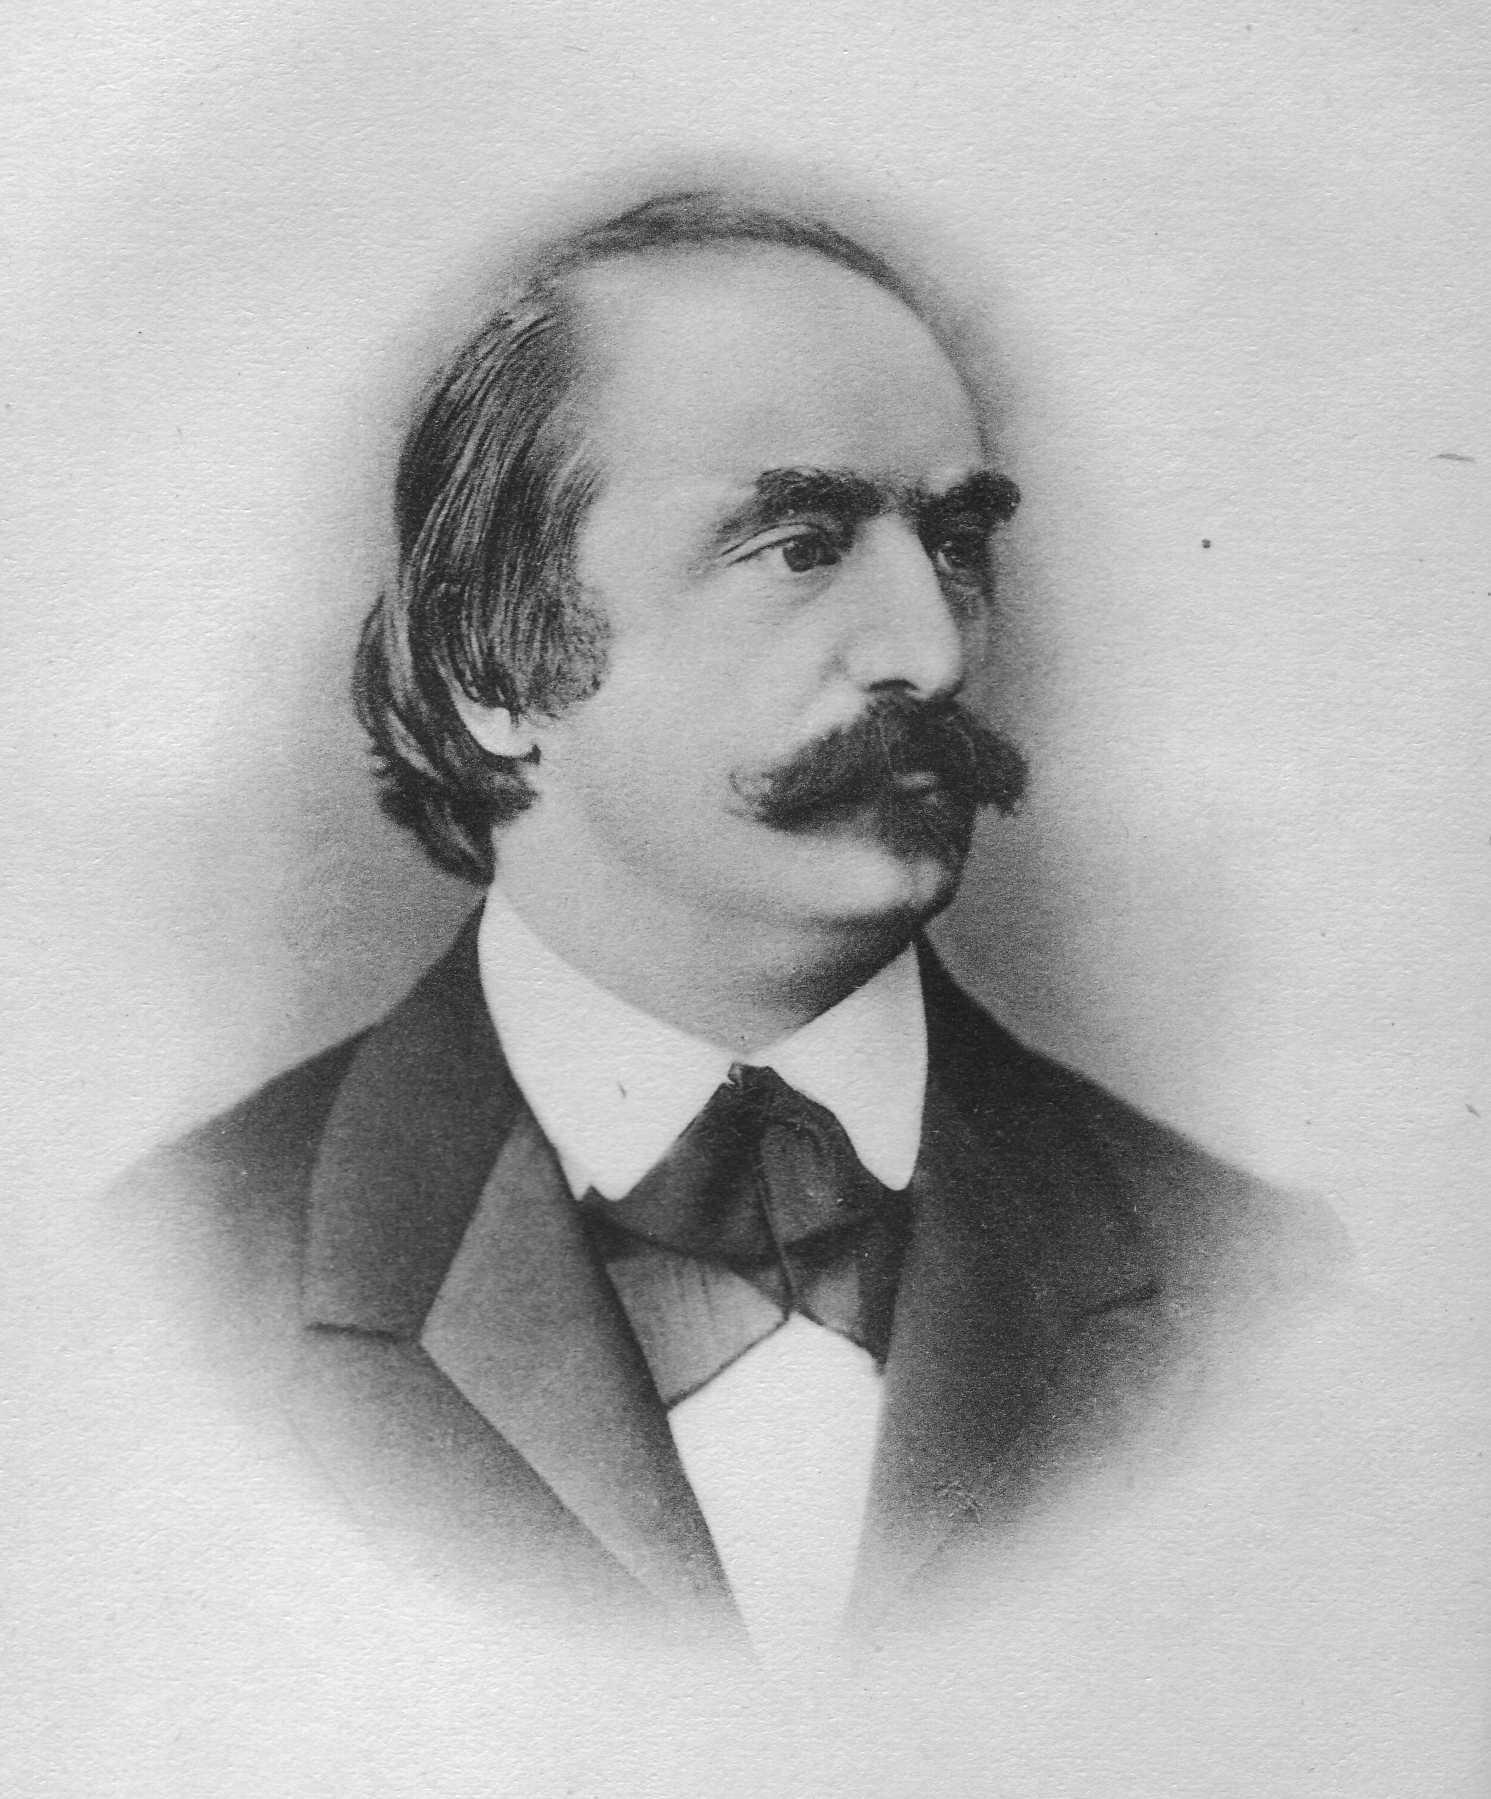 Portrait of Eduard Hanslick, 40 years old